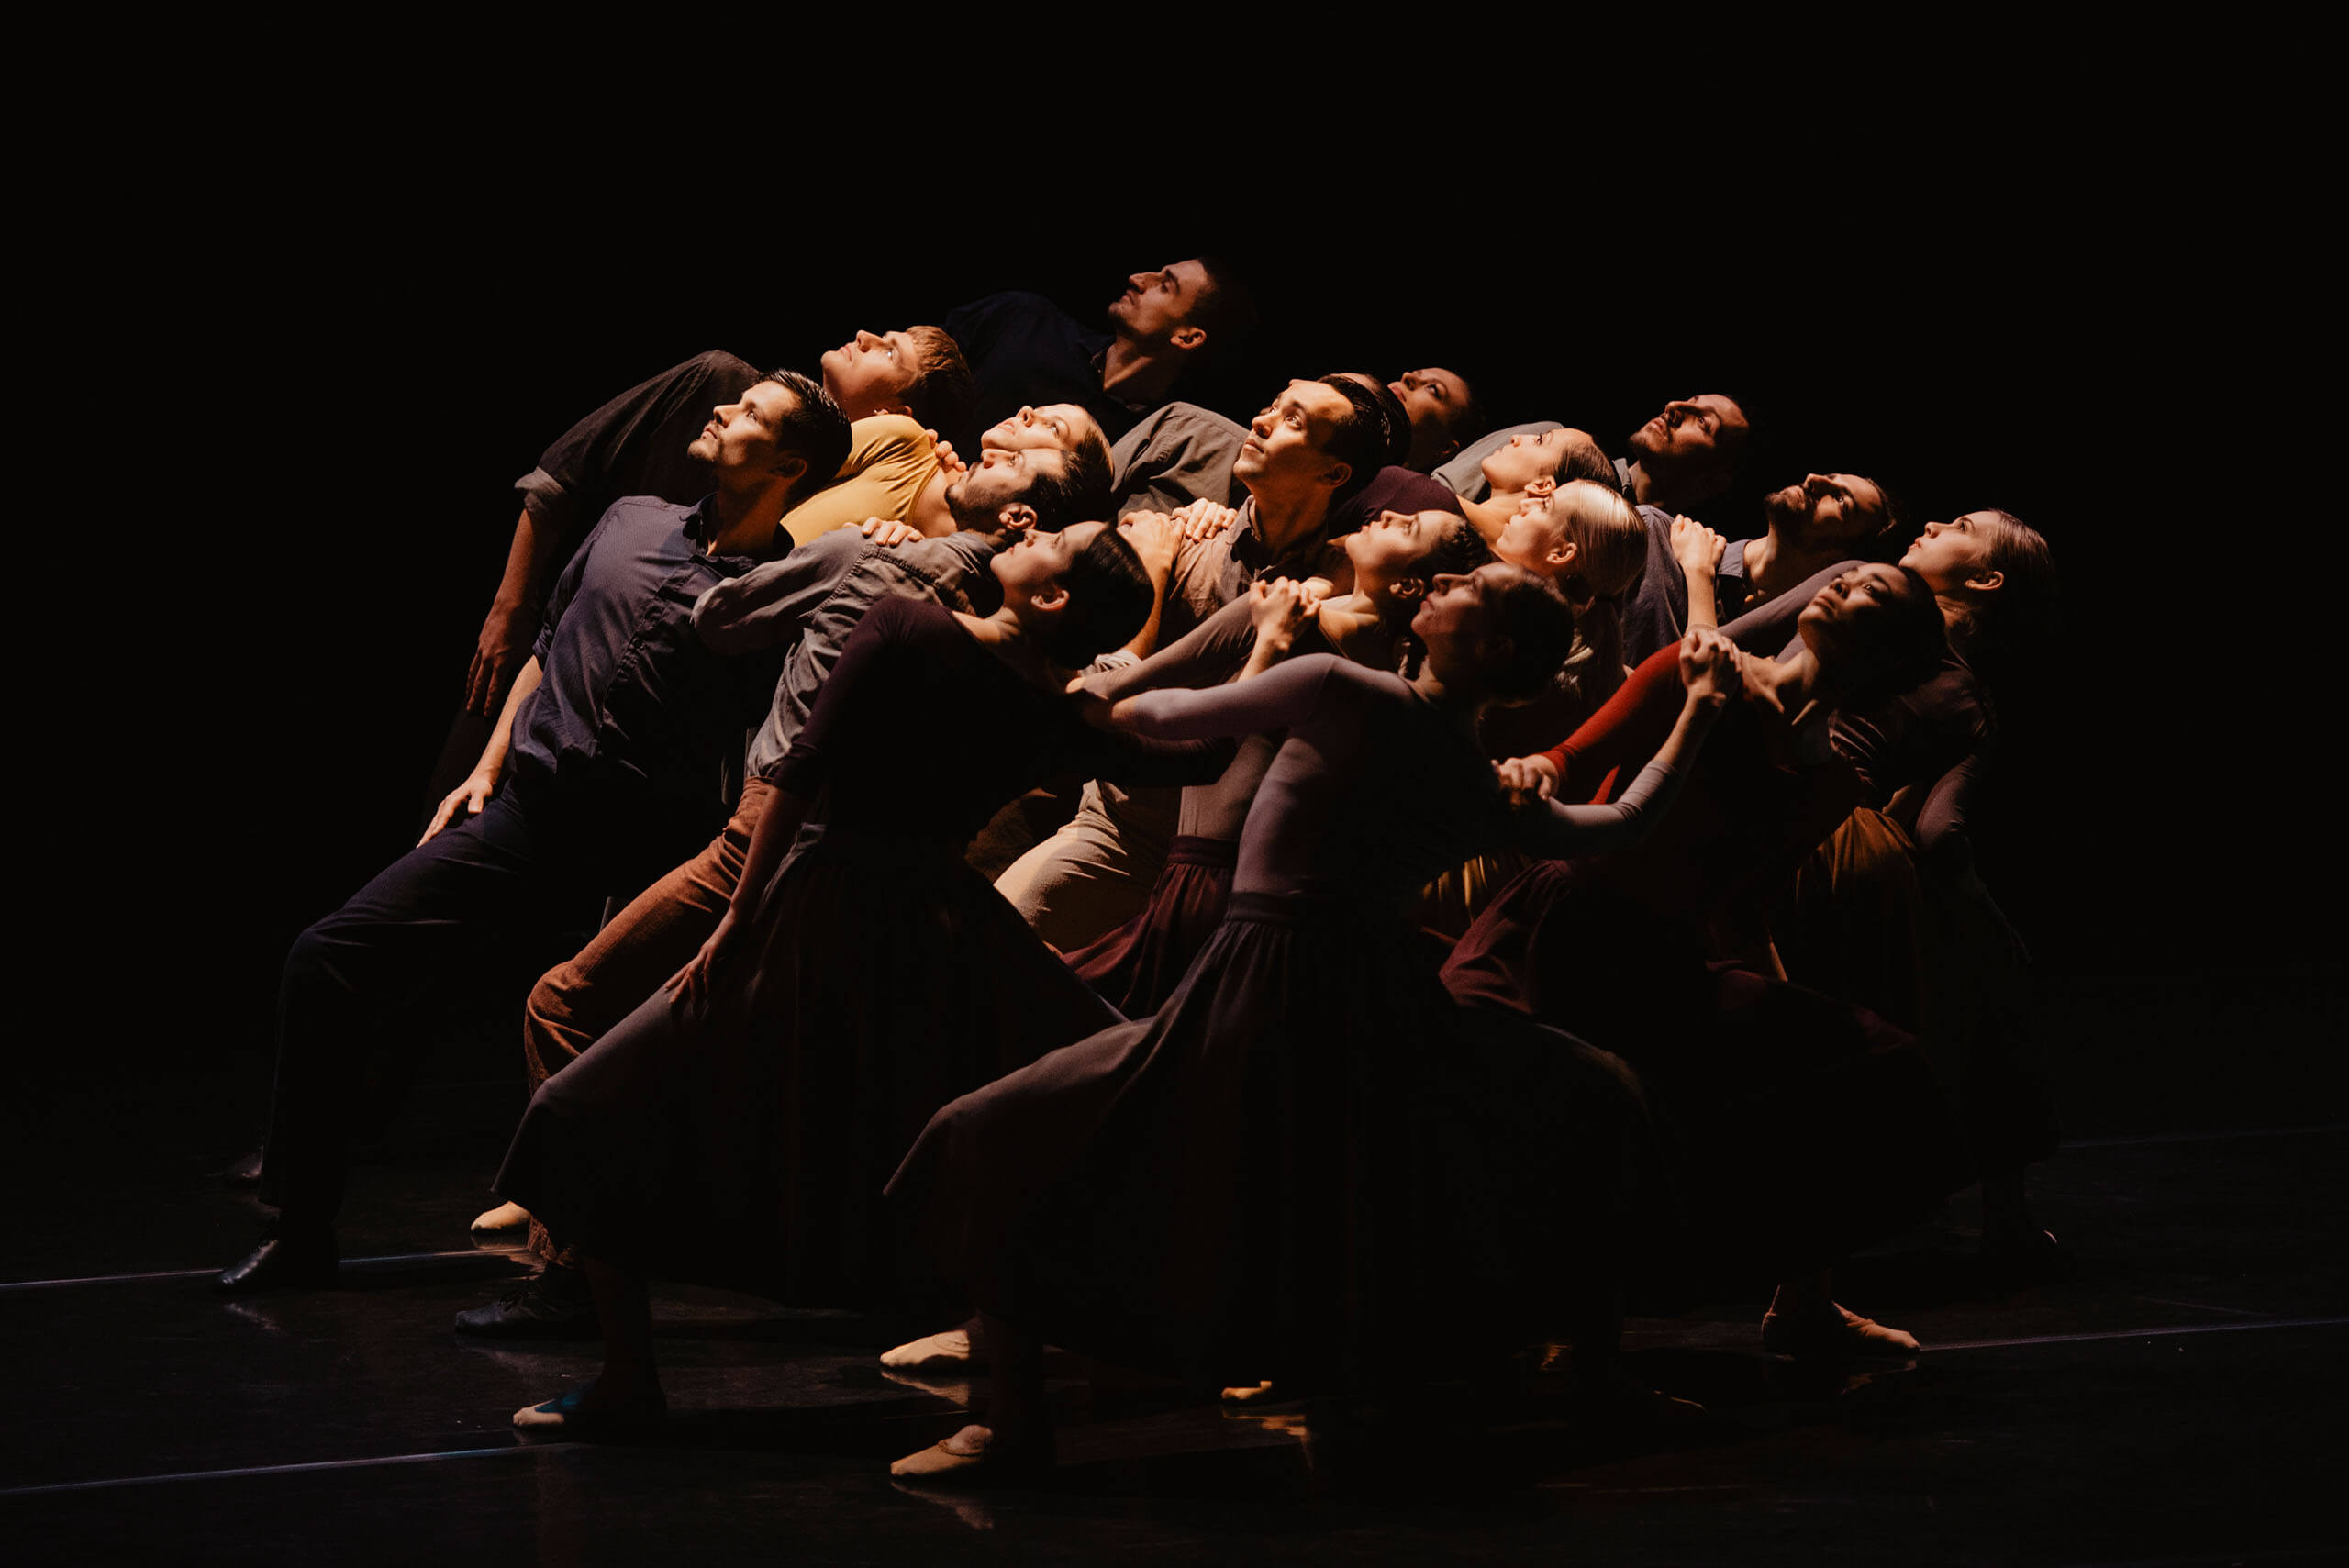 theaterfotografie dans